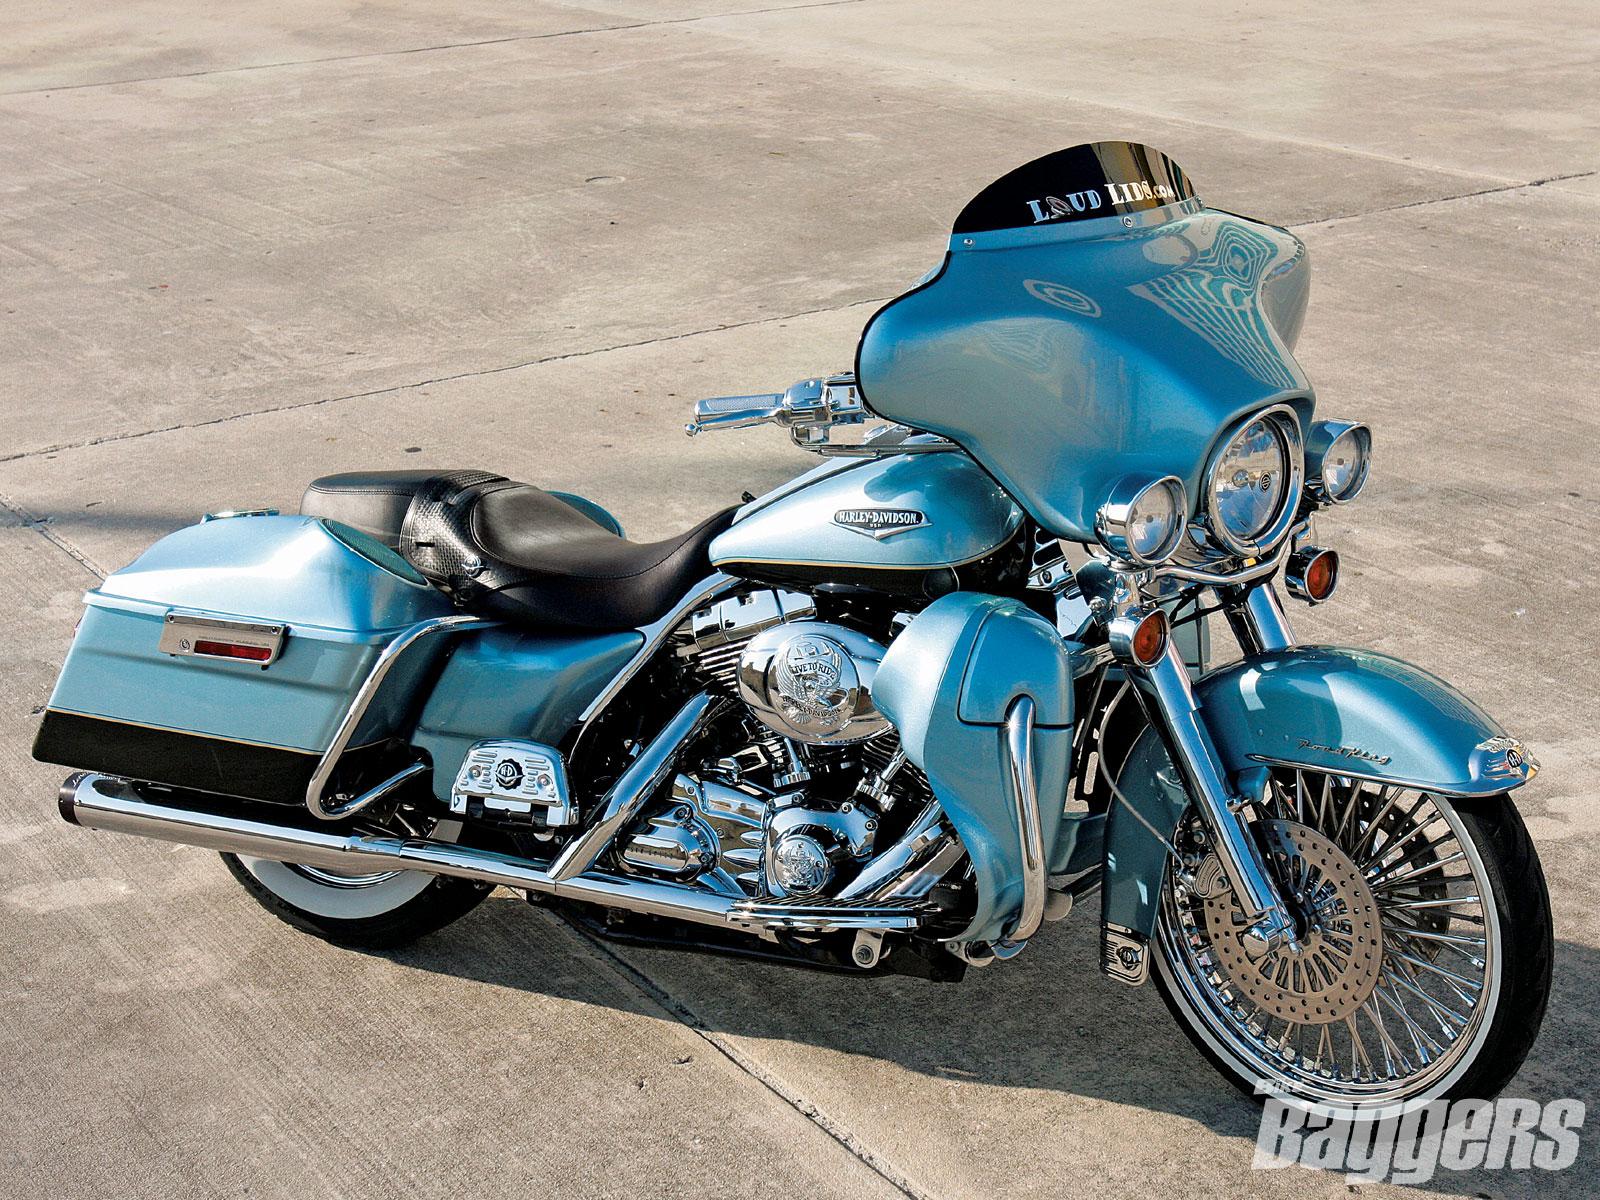 Harley Davidson Classic: Classic Harley Davidson Road King